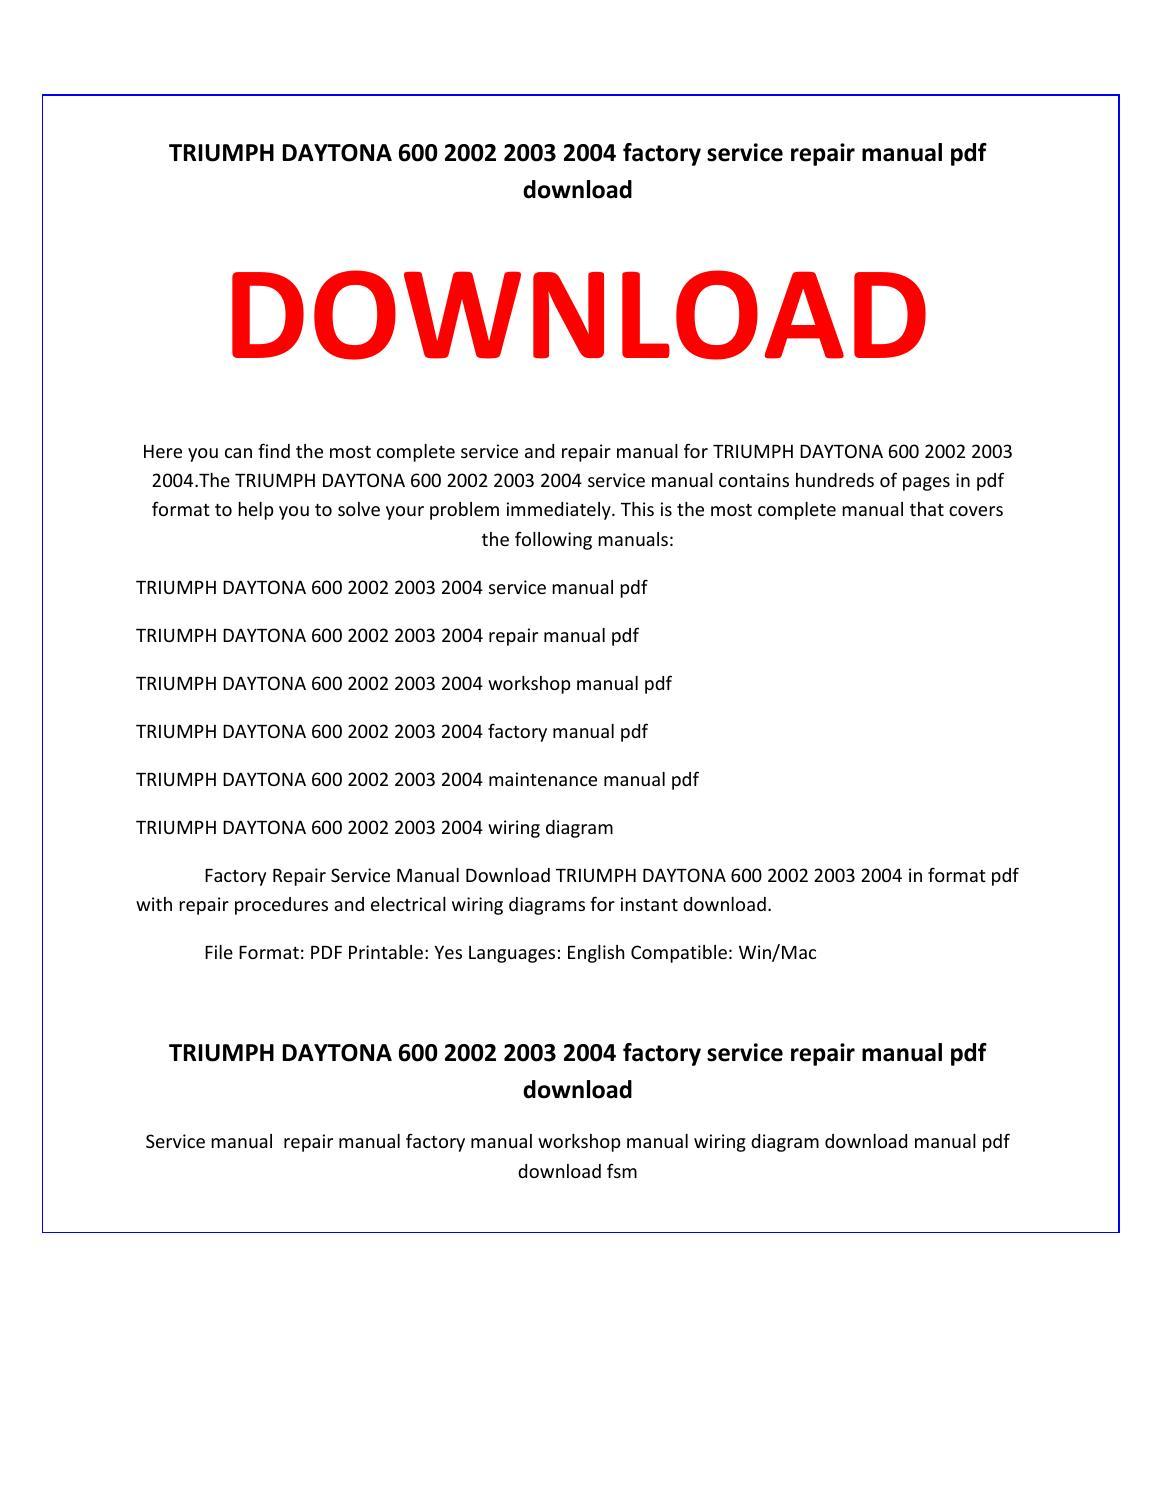 Triumph daytona 600 2002 2003 2004 service repair manual by service manual  - issuu